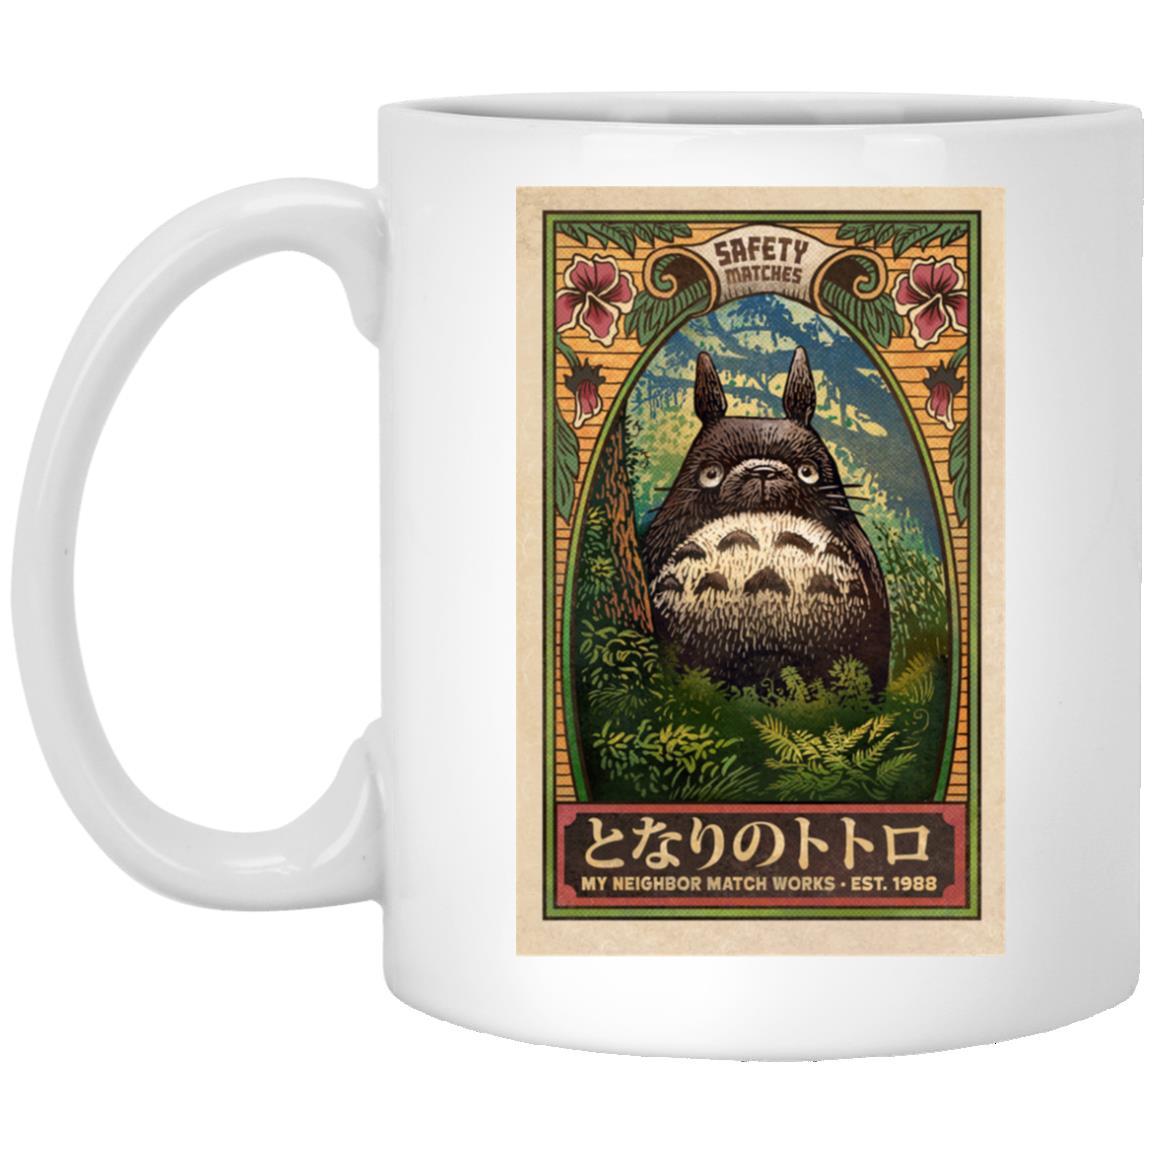 My Neighbor Totoro Safety Matches 1988 Mug